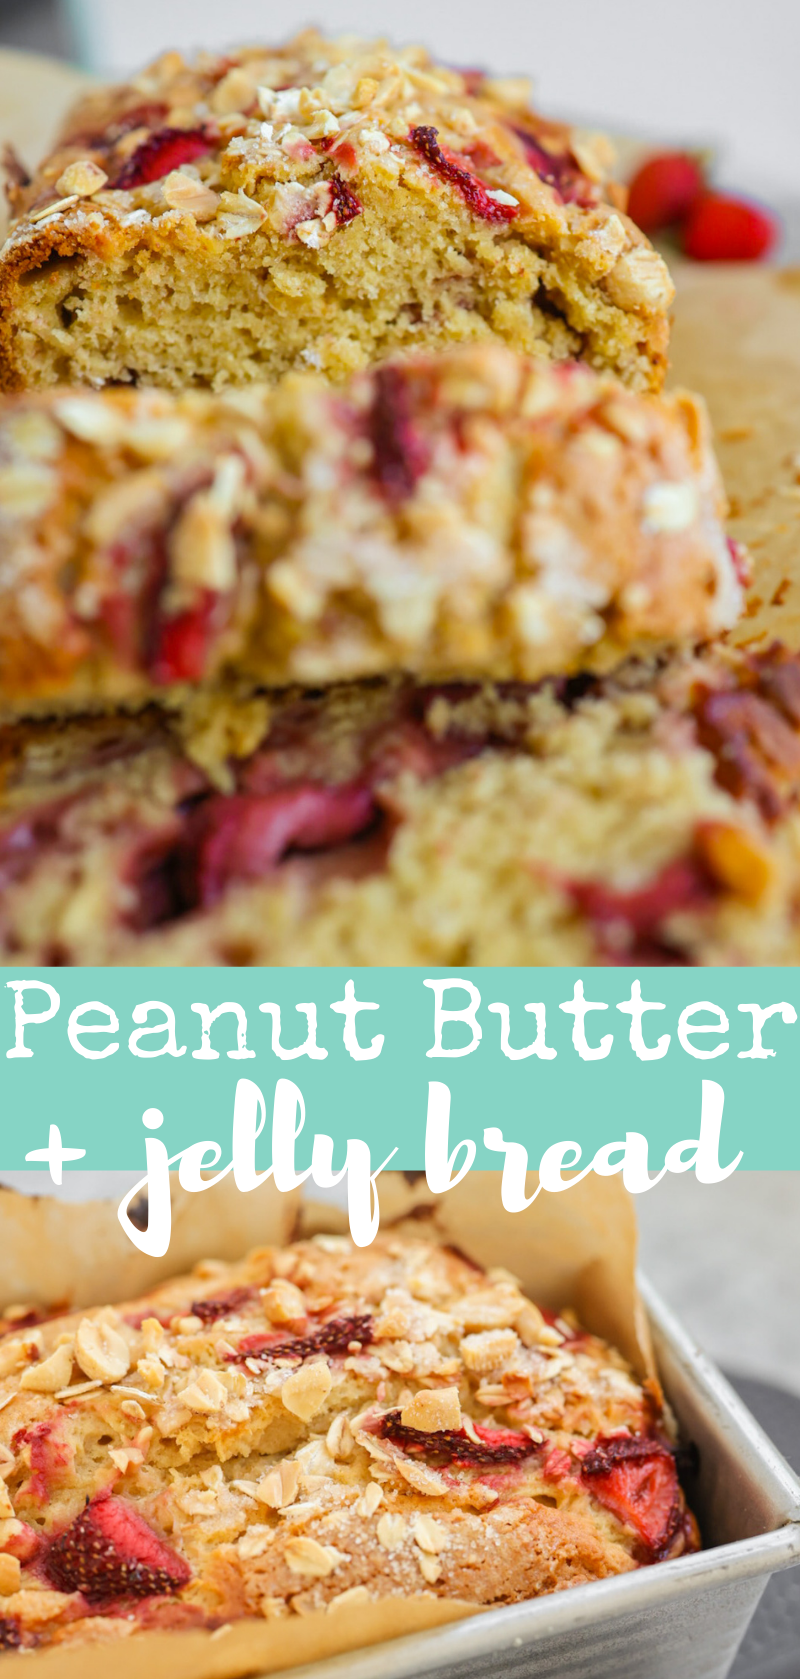 pin Peanut Butter & Jelly Bread